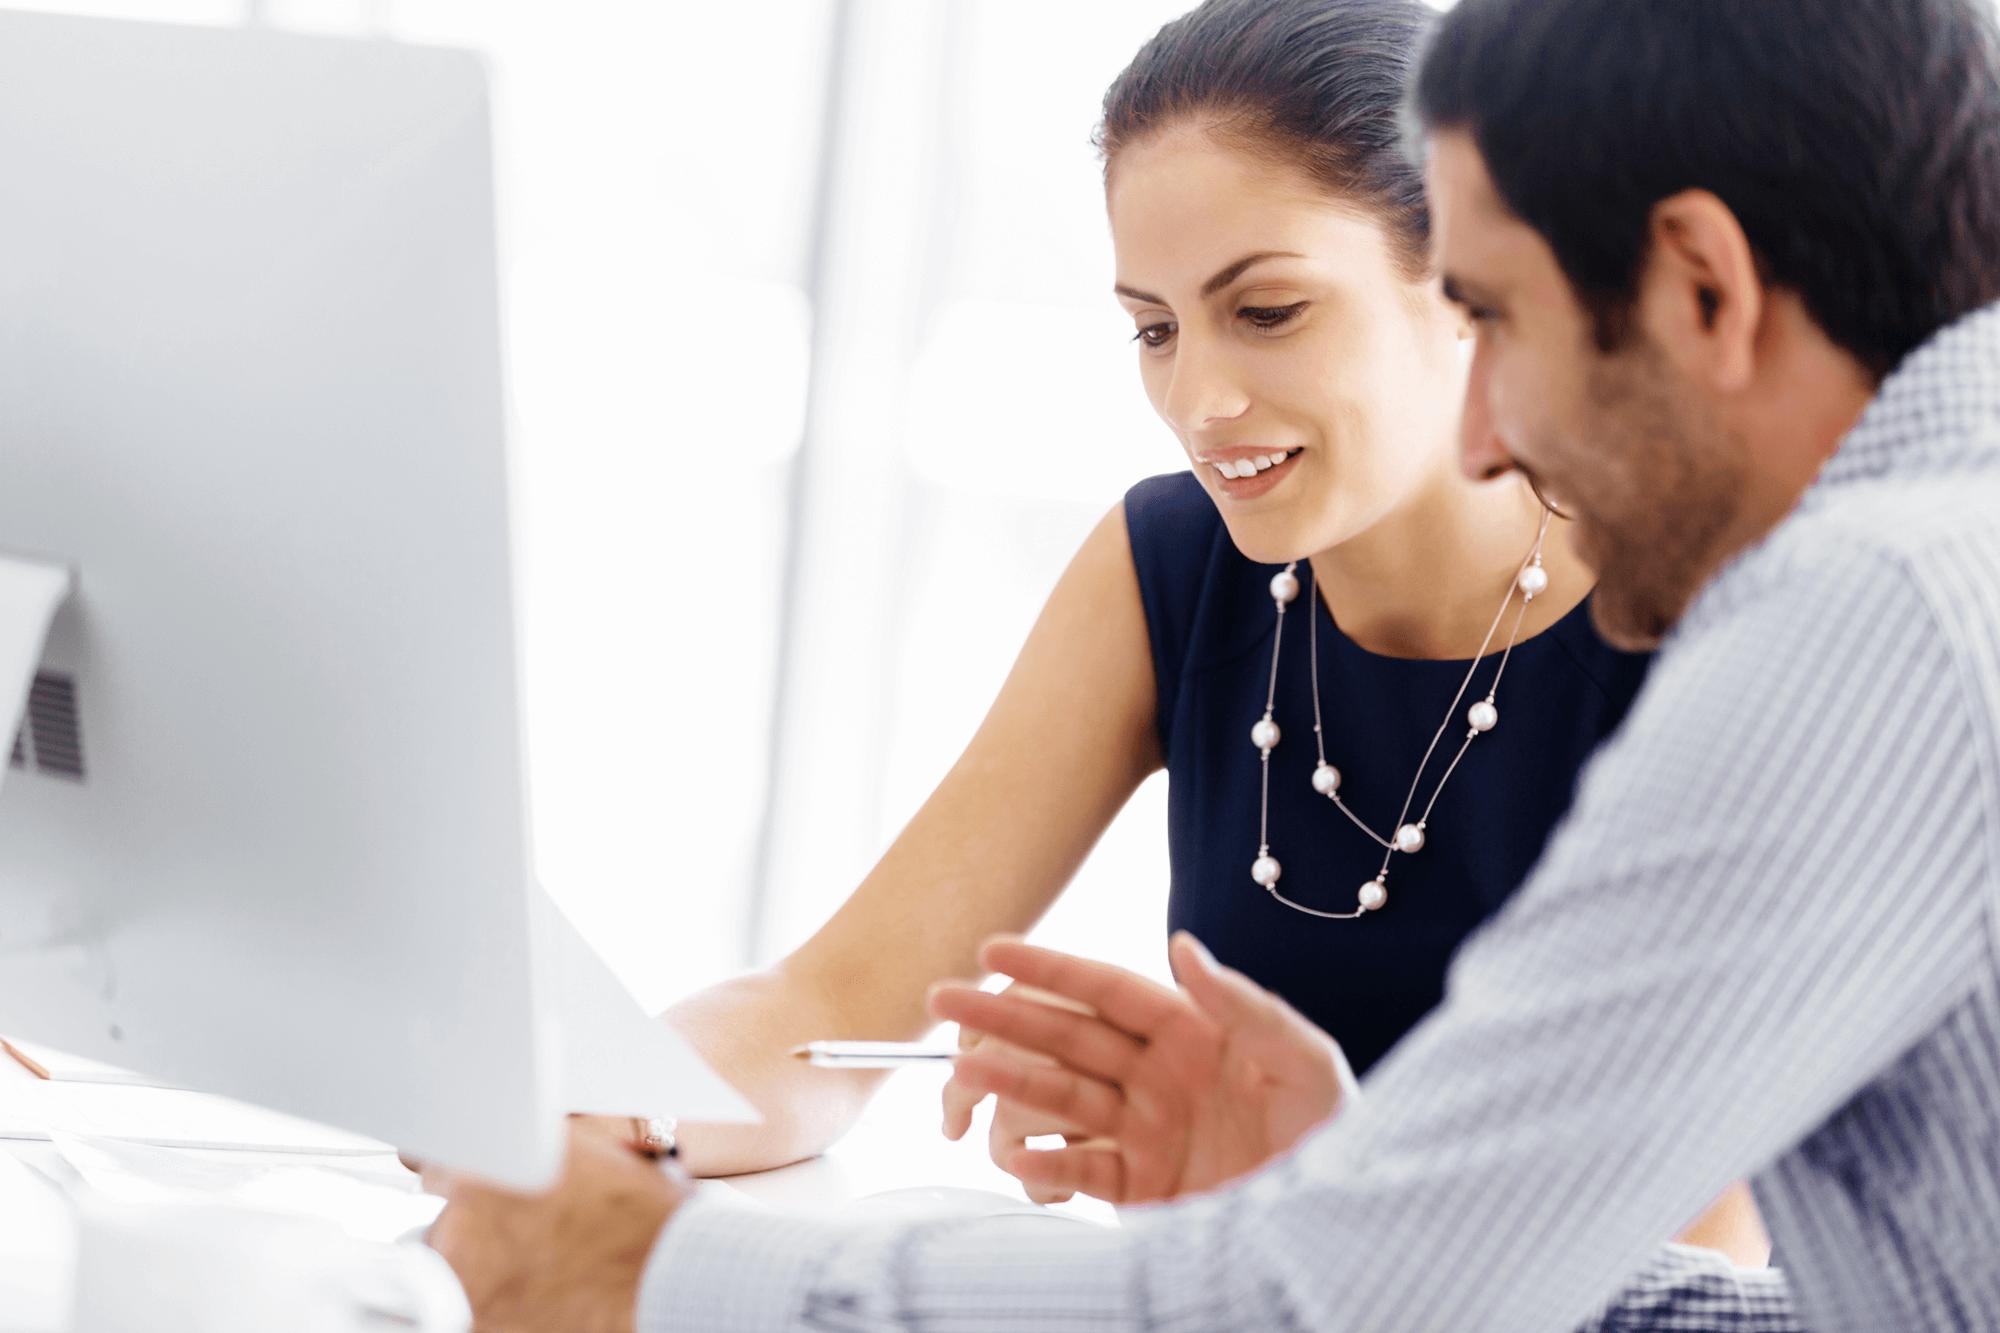 Agile Working   100% agility   Pitfalls & Advantages   Advice